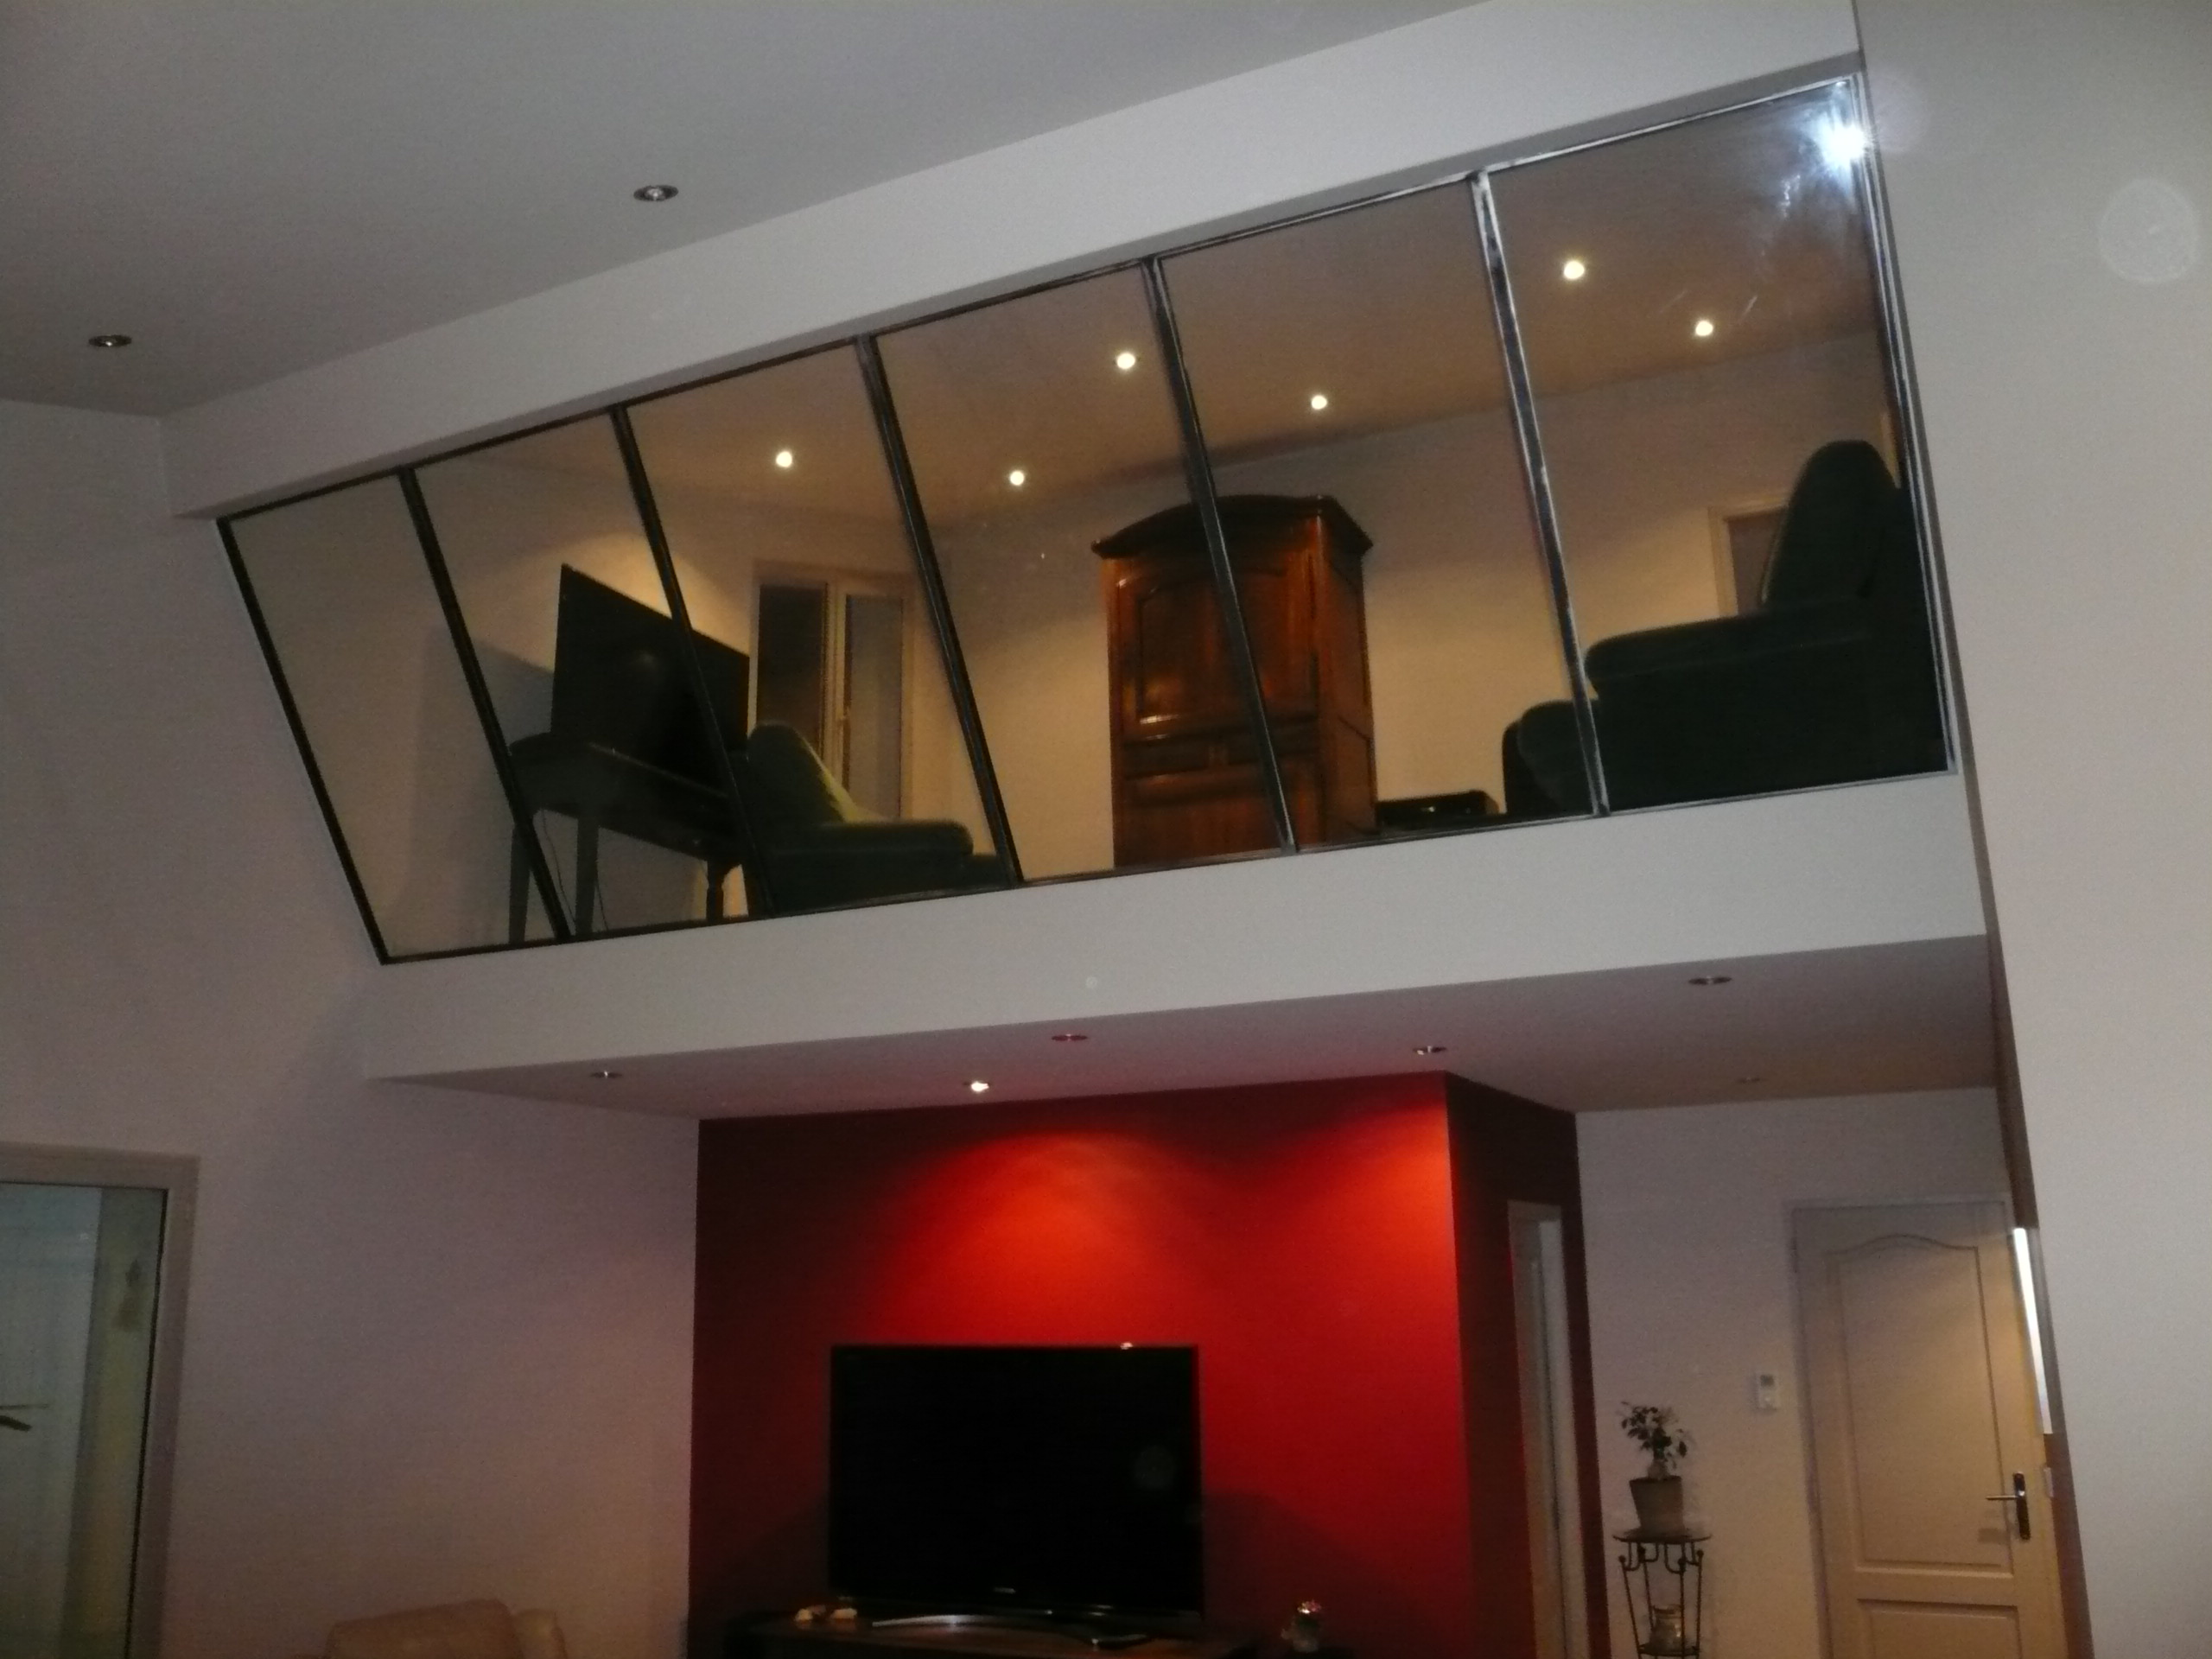 luc martin ferronnerie 26 serrurerie 26 metallerie 26 vente ferronnerie 26. Black Bedroom Furniture Sets. Home Design Ideas